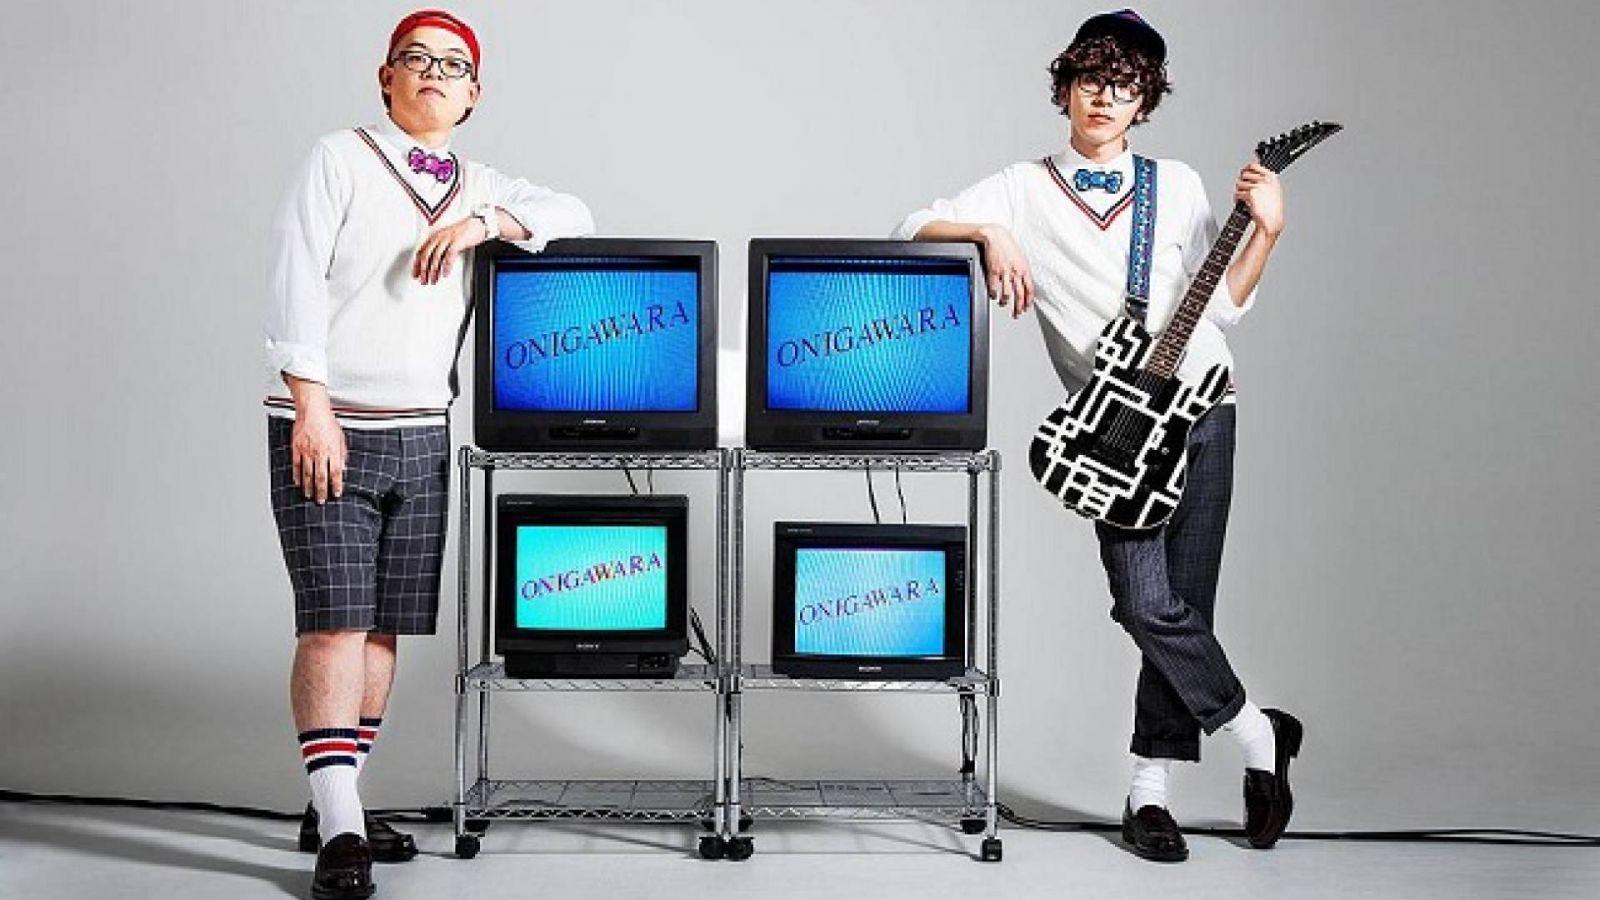 New Album from ONIGAWARA © 2015 ONIGAWARA